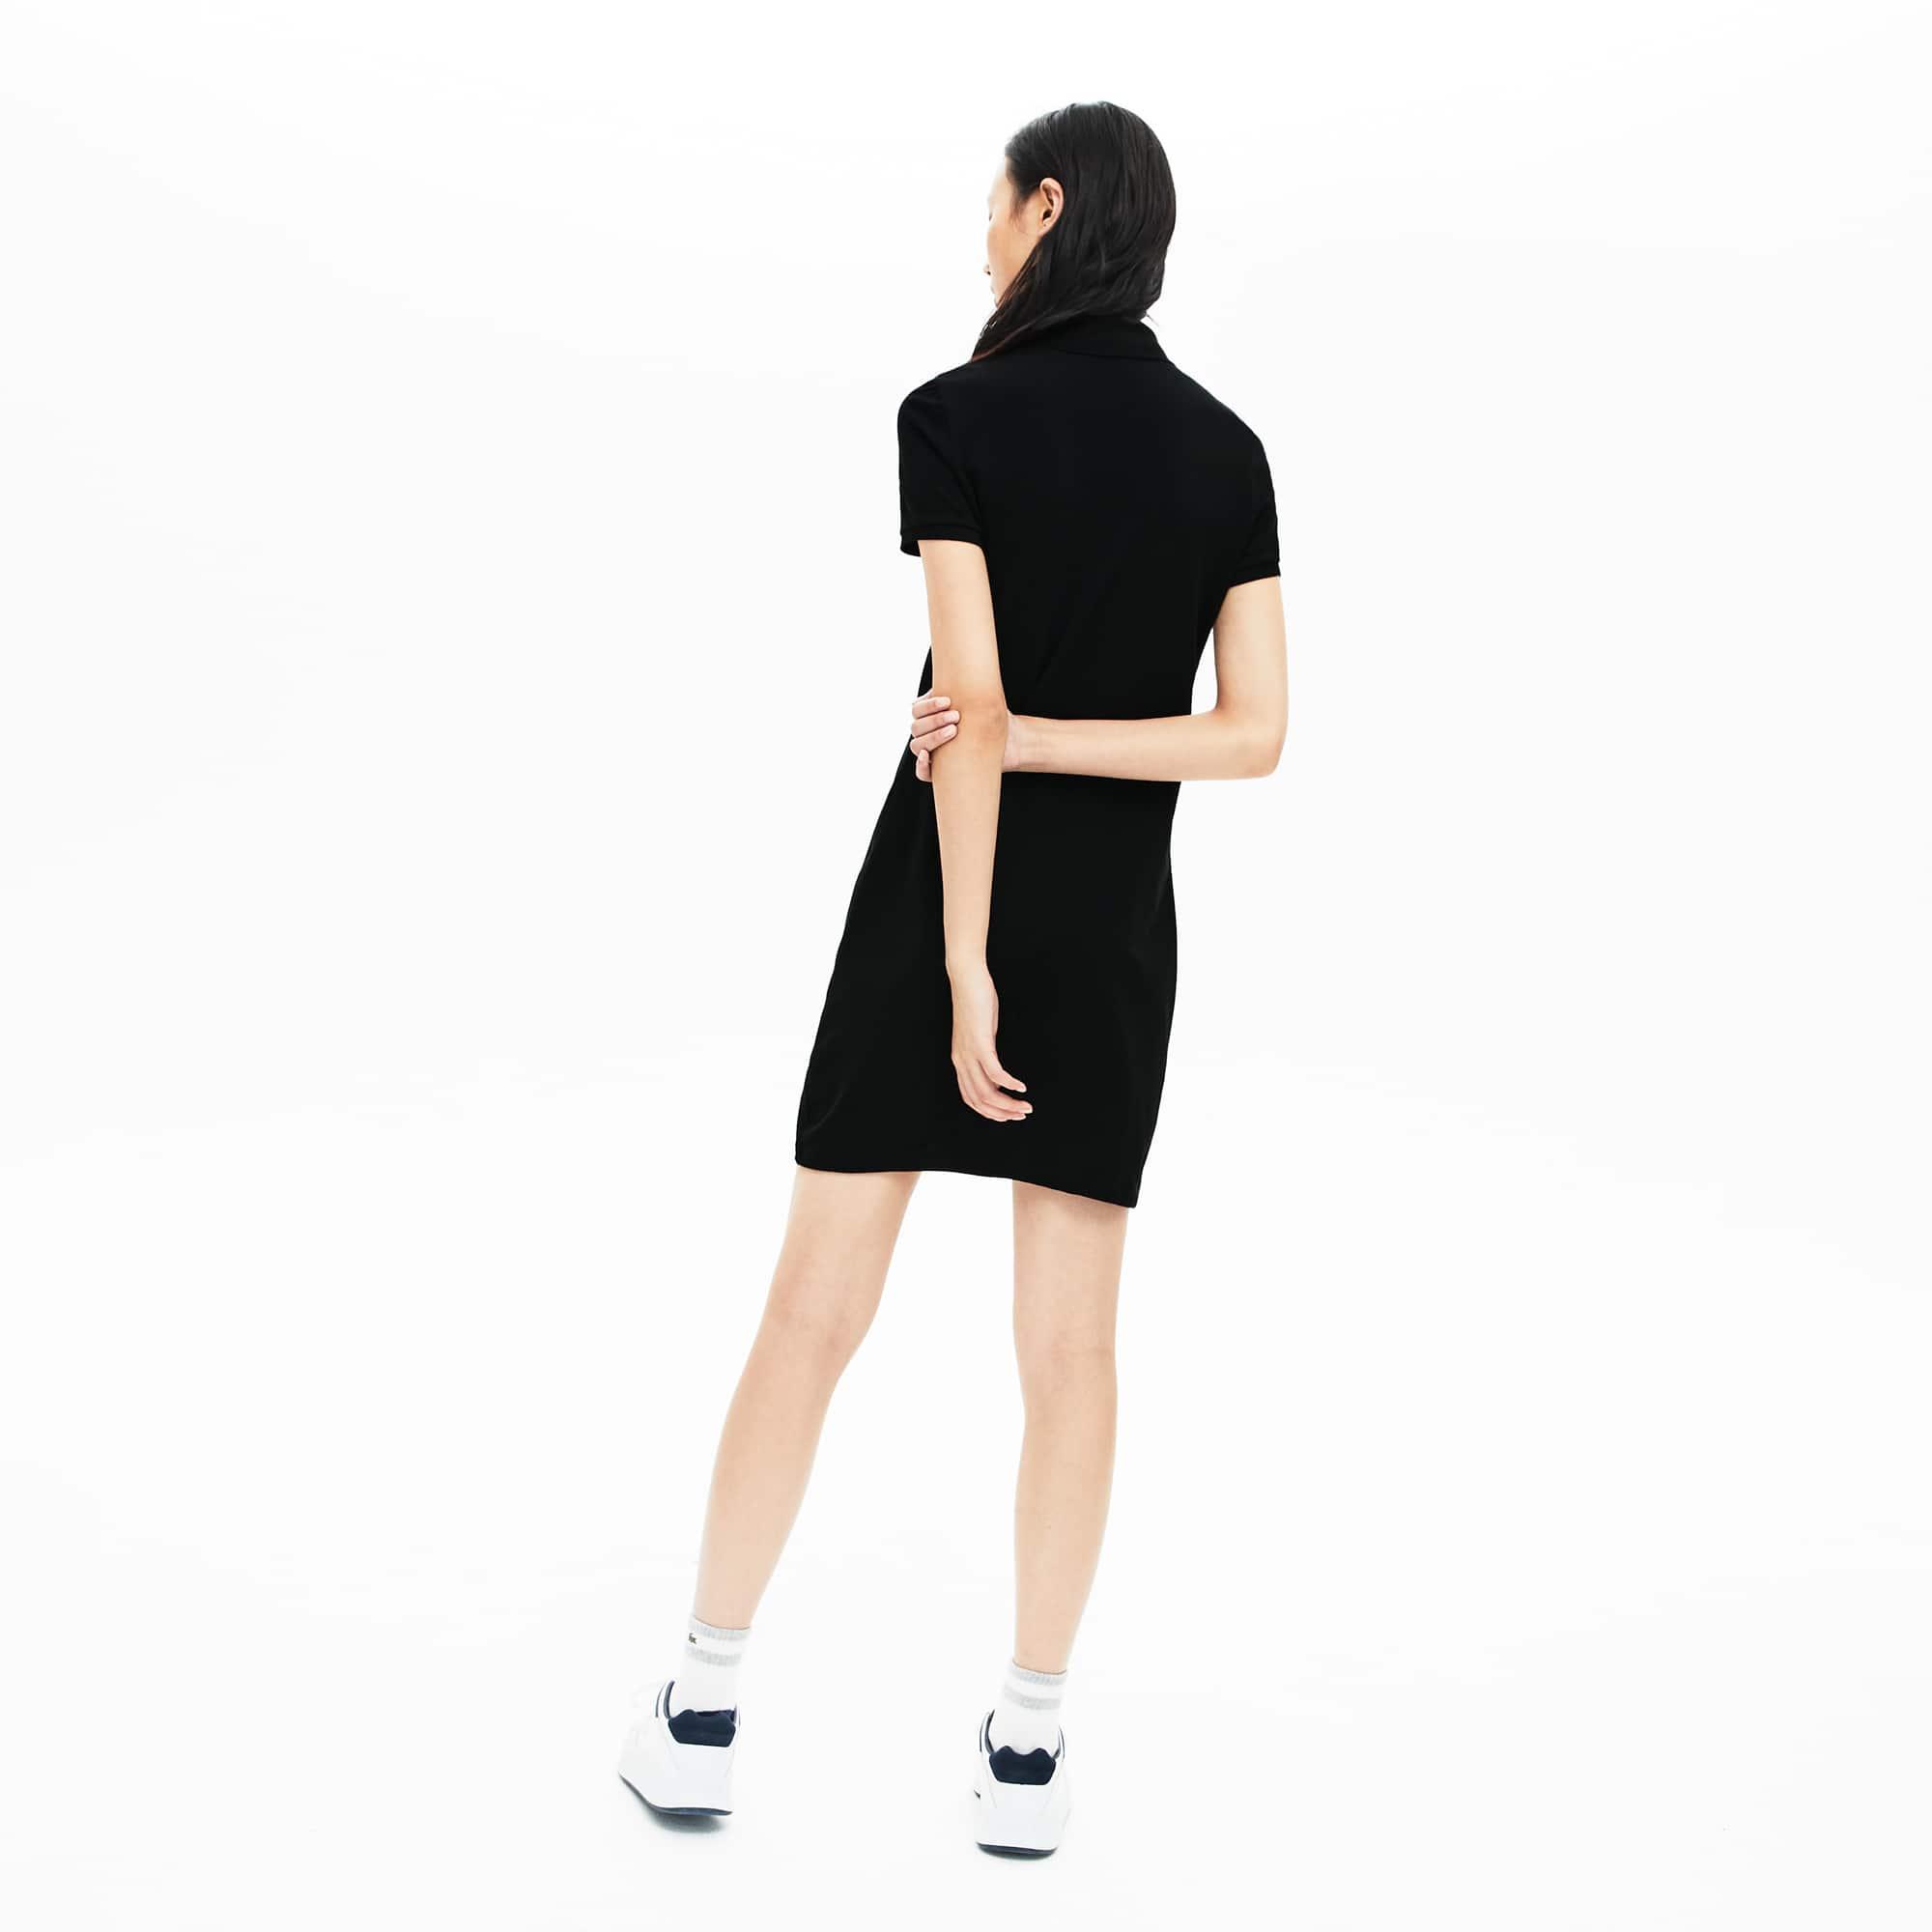 9211ba08f01 Vestido Polo De Mujer En Mini Piqué De Algodón Elástico